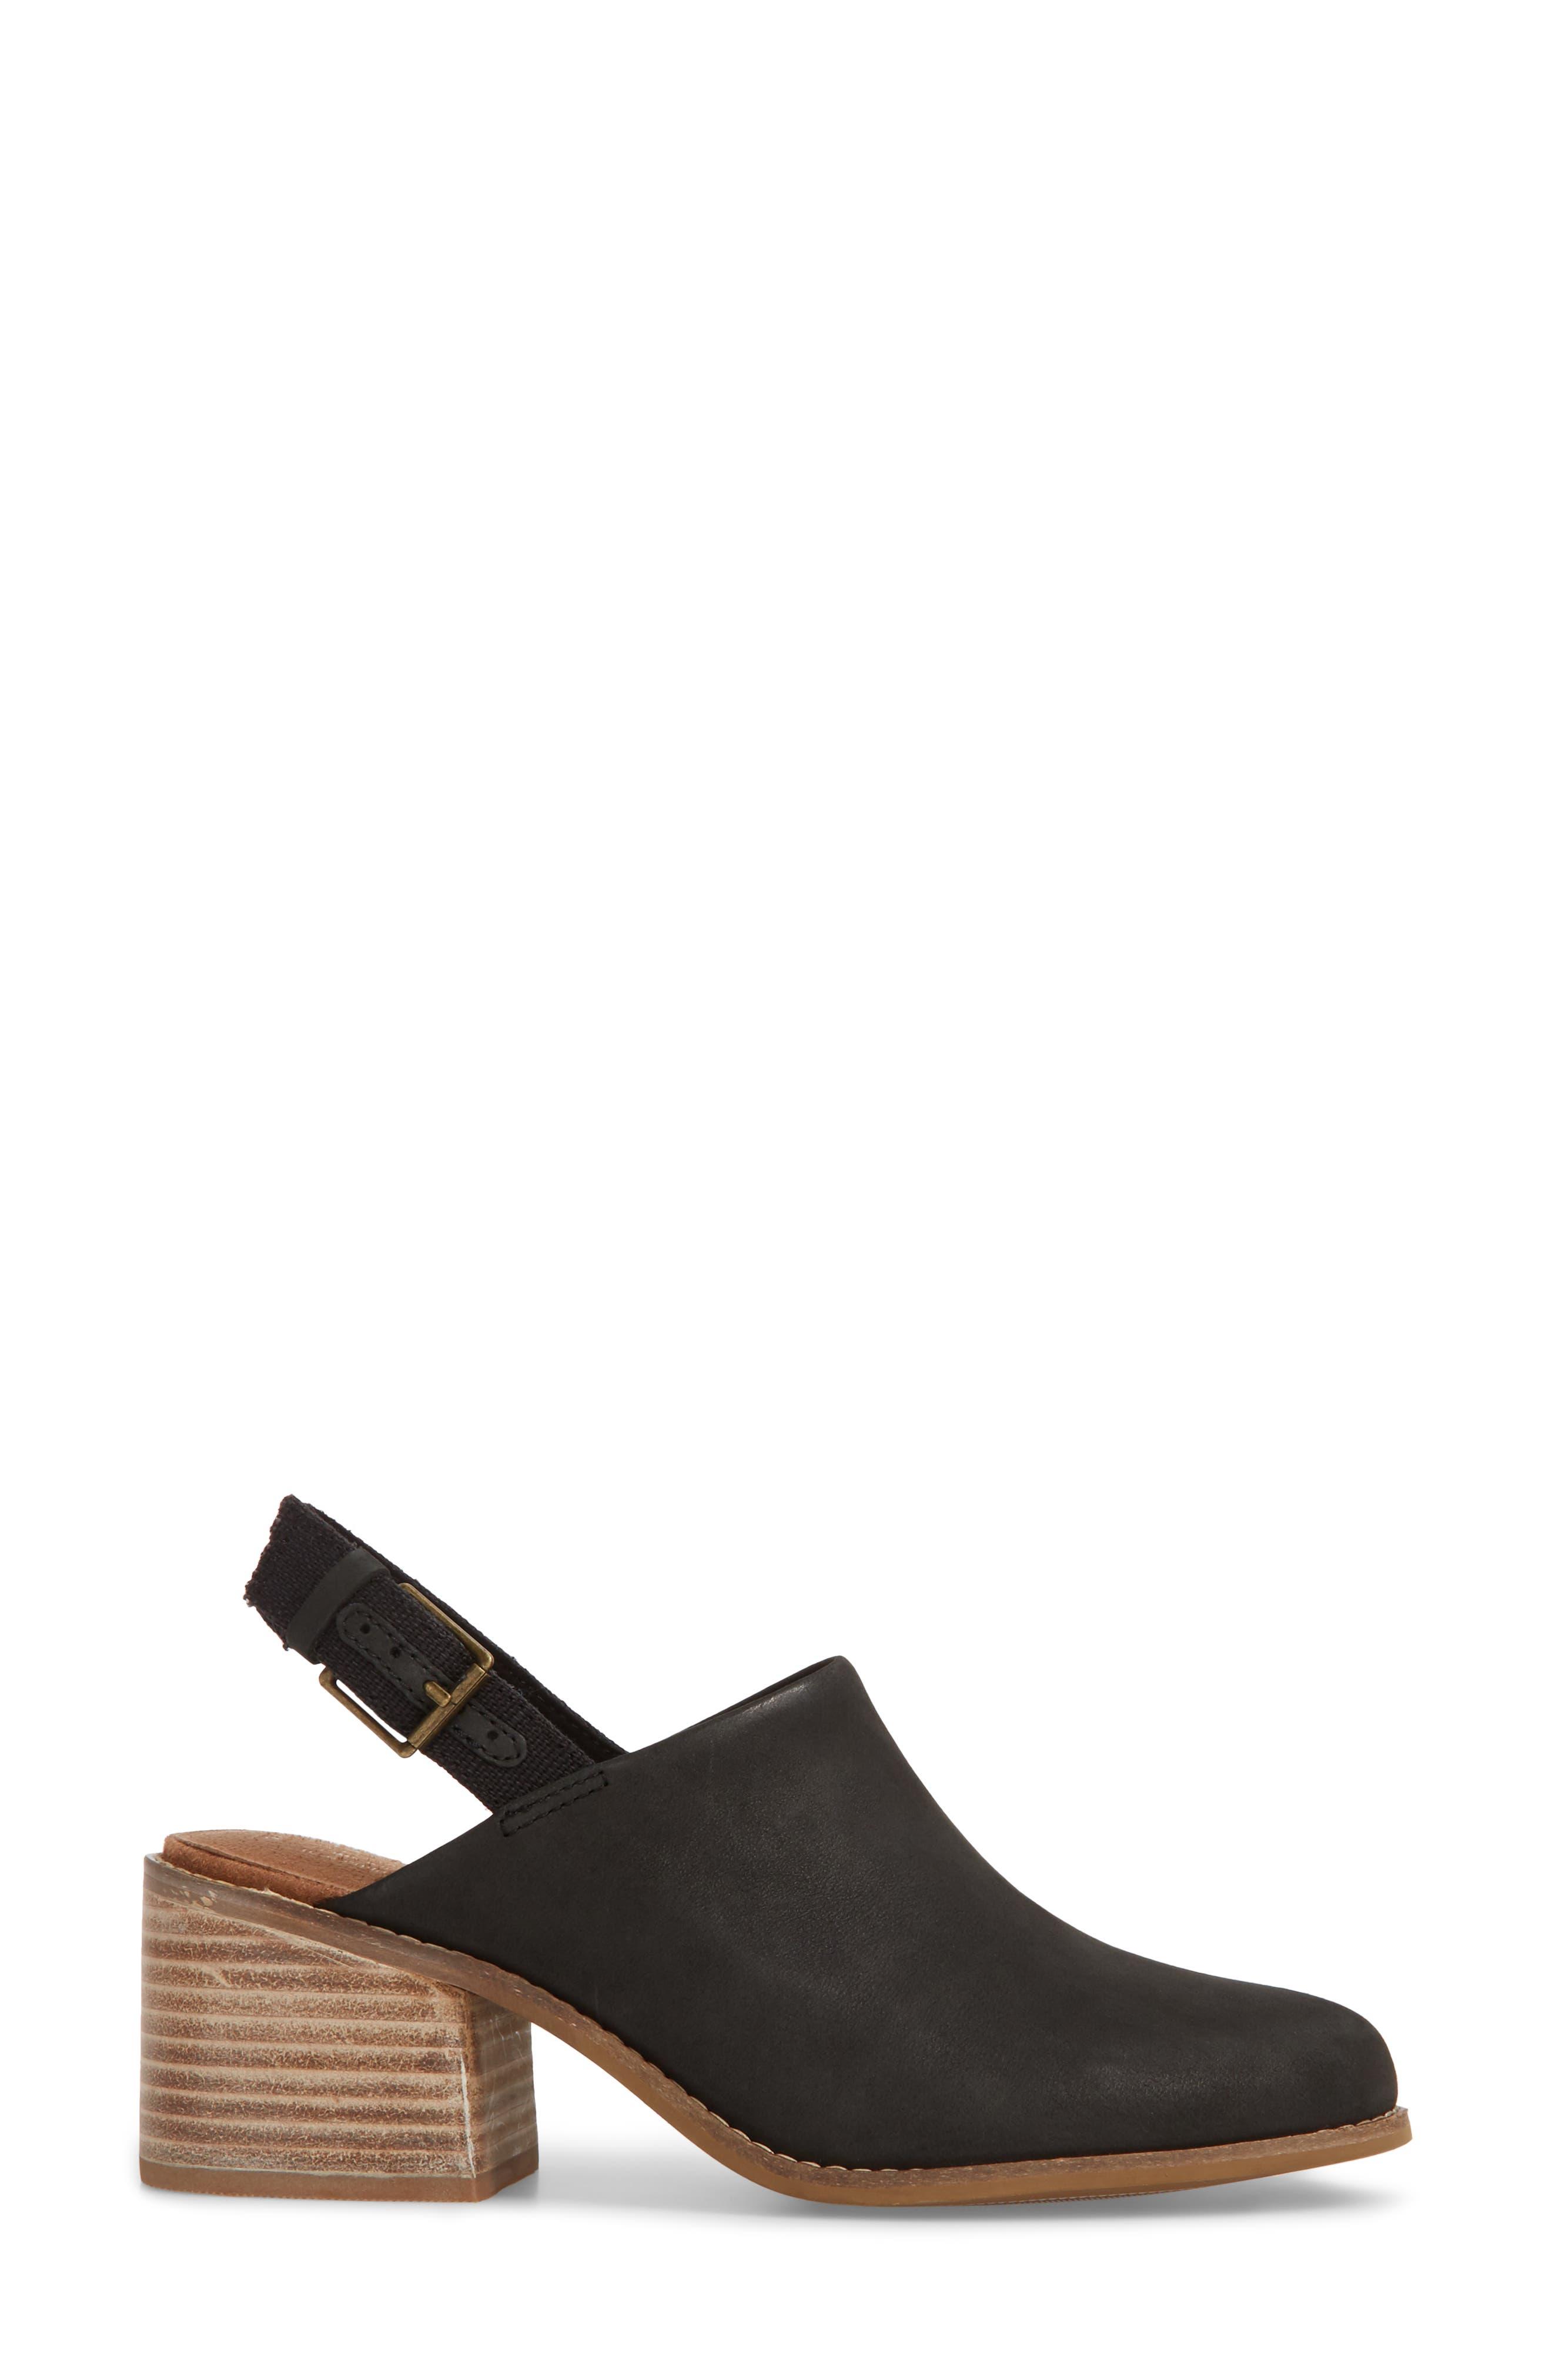 Leila Slingback Sandal,                             Alternate thumbnail 3, color,                             Black Leather